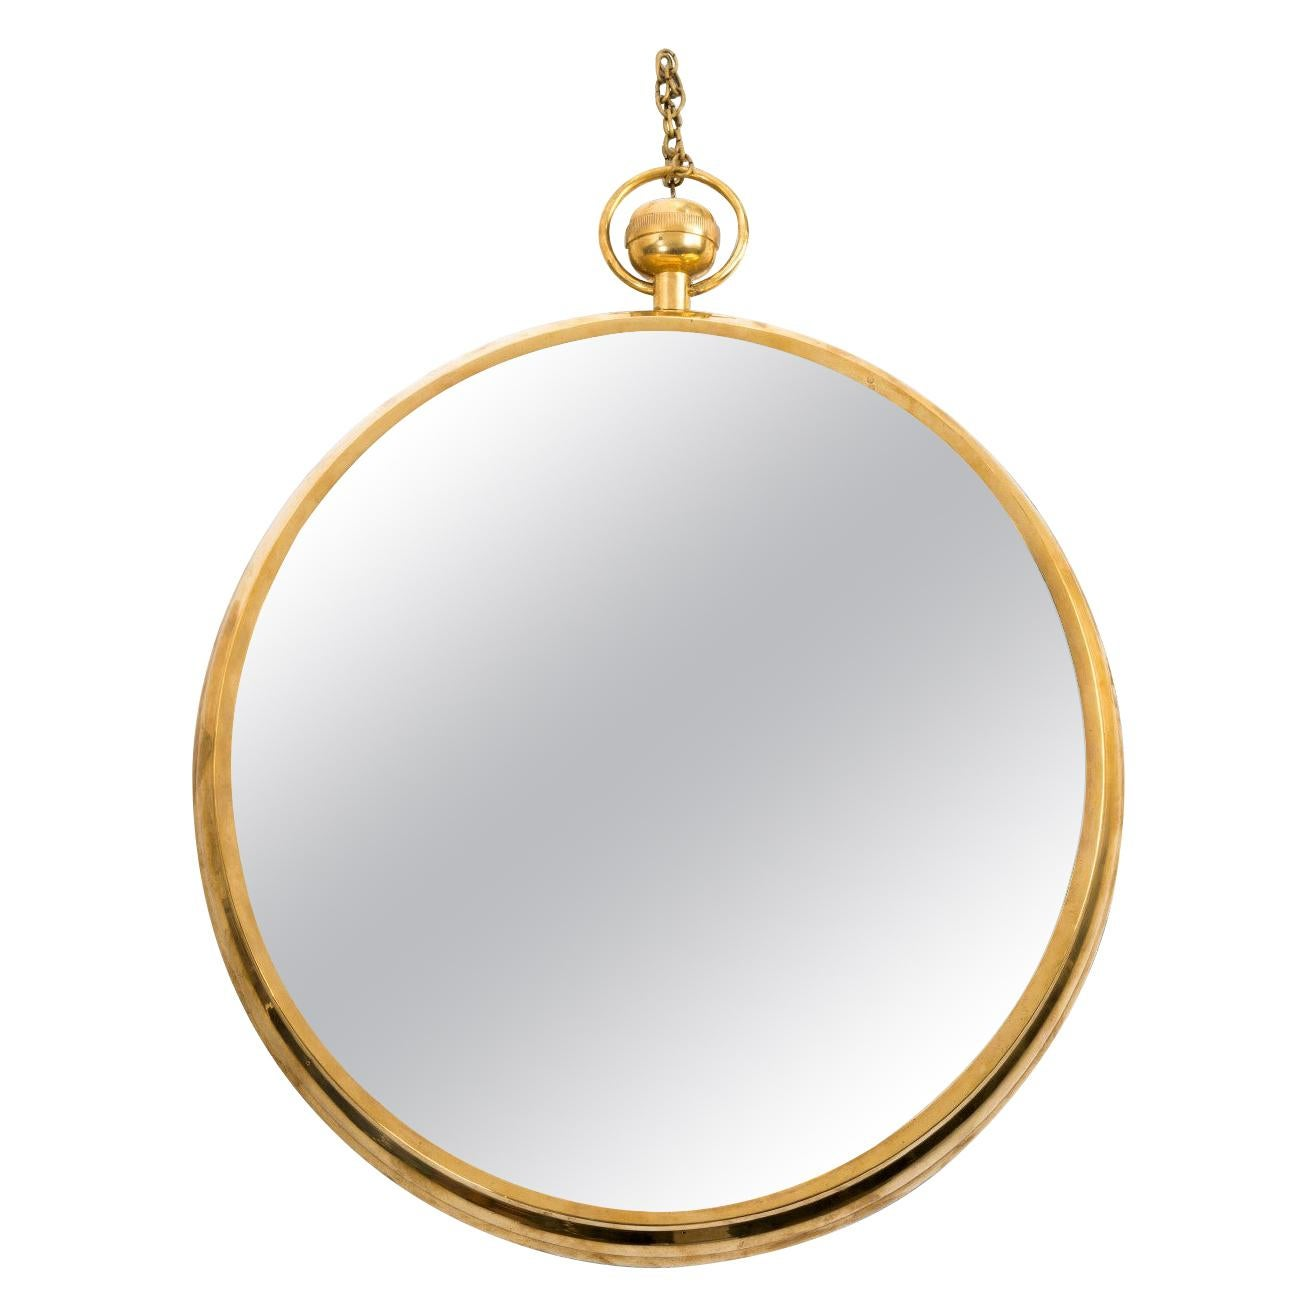 Mid Century Modern Brass Framed Mirror in the Manner of Fornasetti